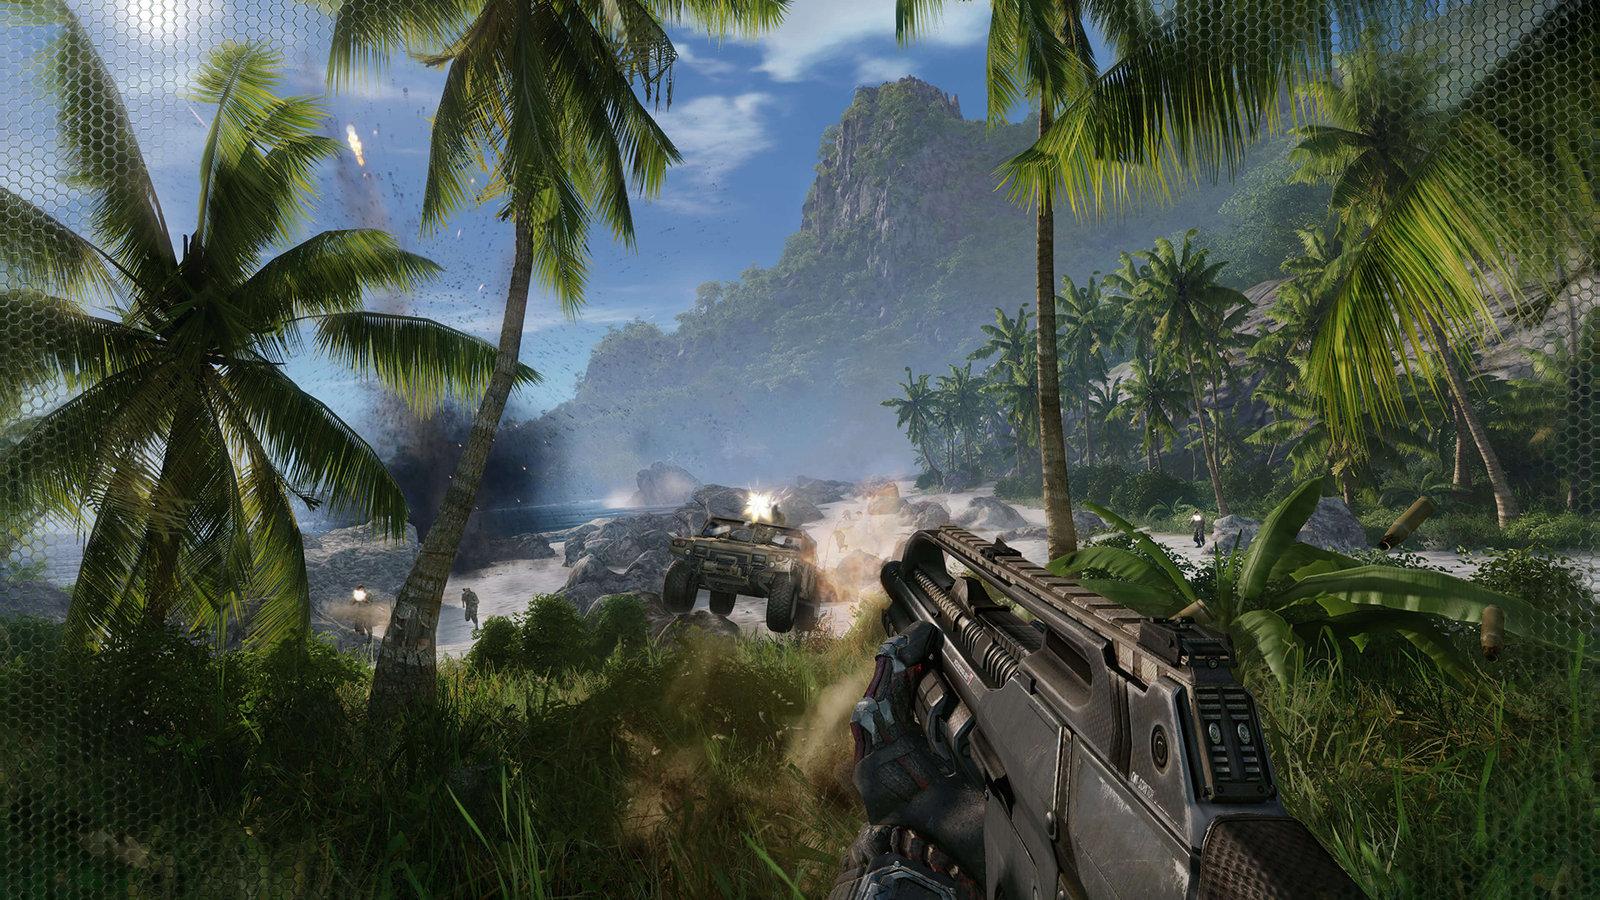 Crysis Remastered image 1